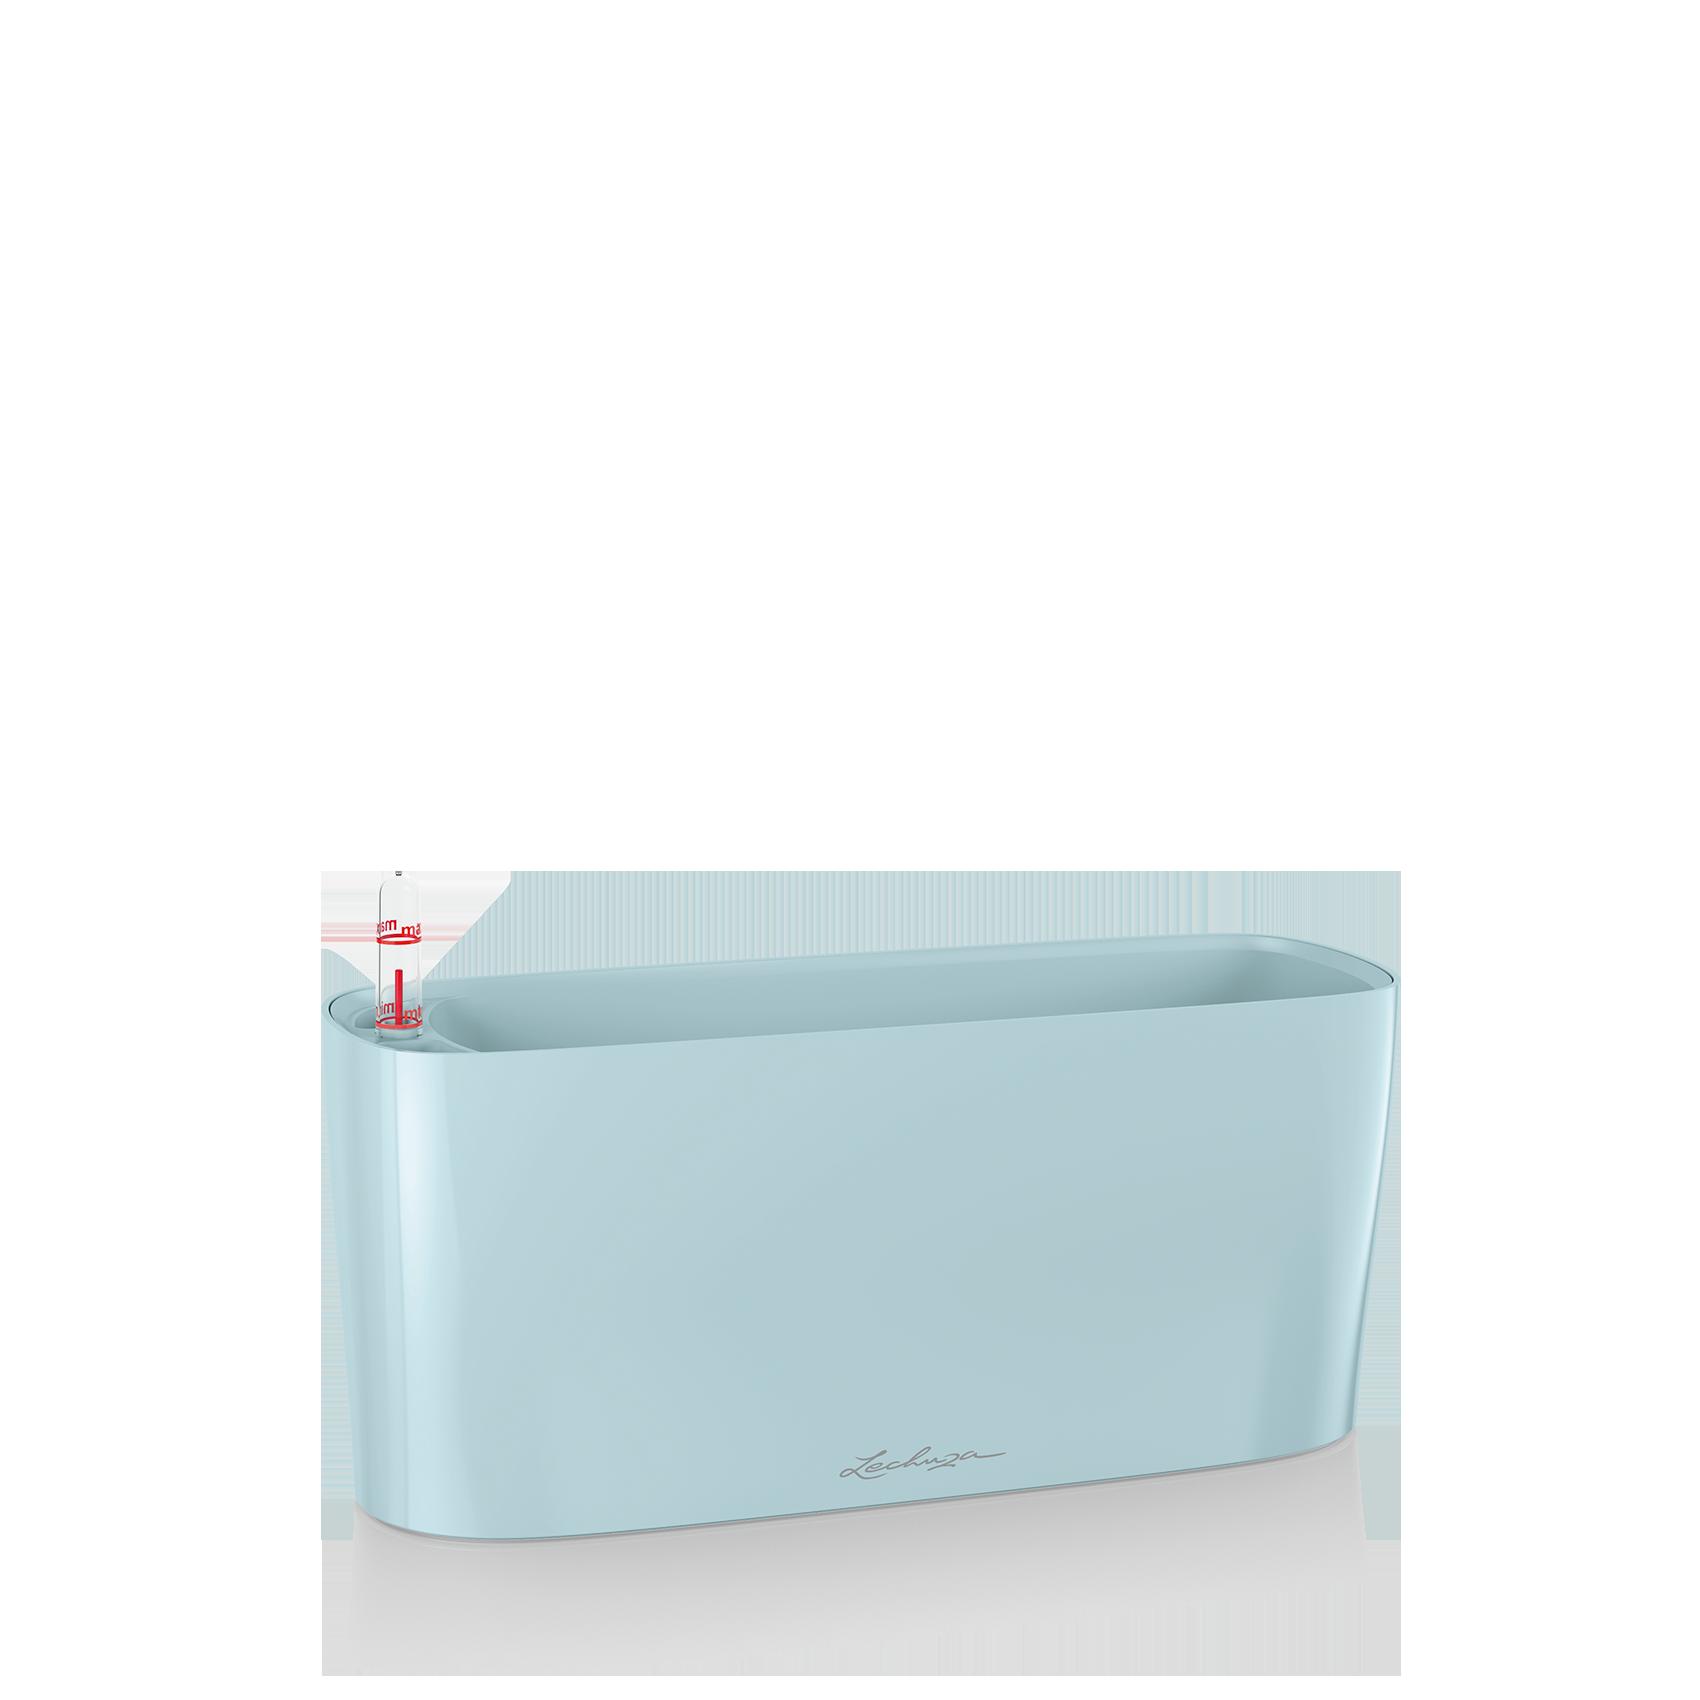 DELTA 10 ice blue high-gloss